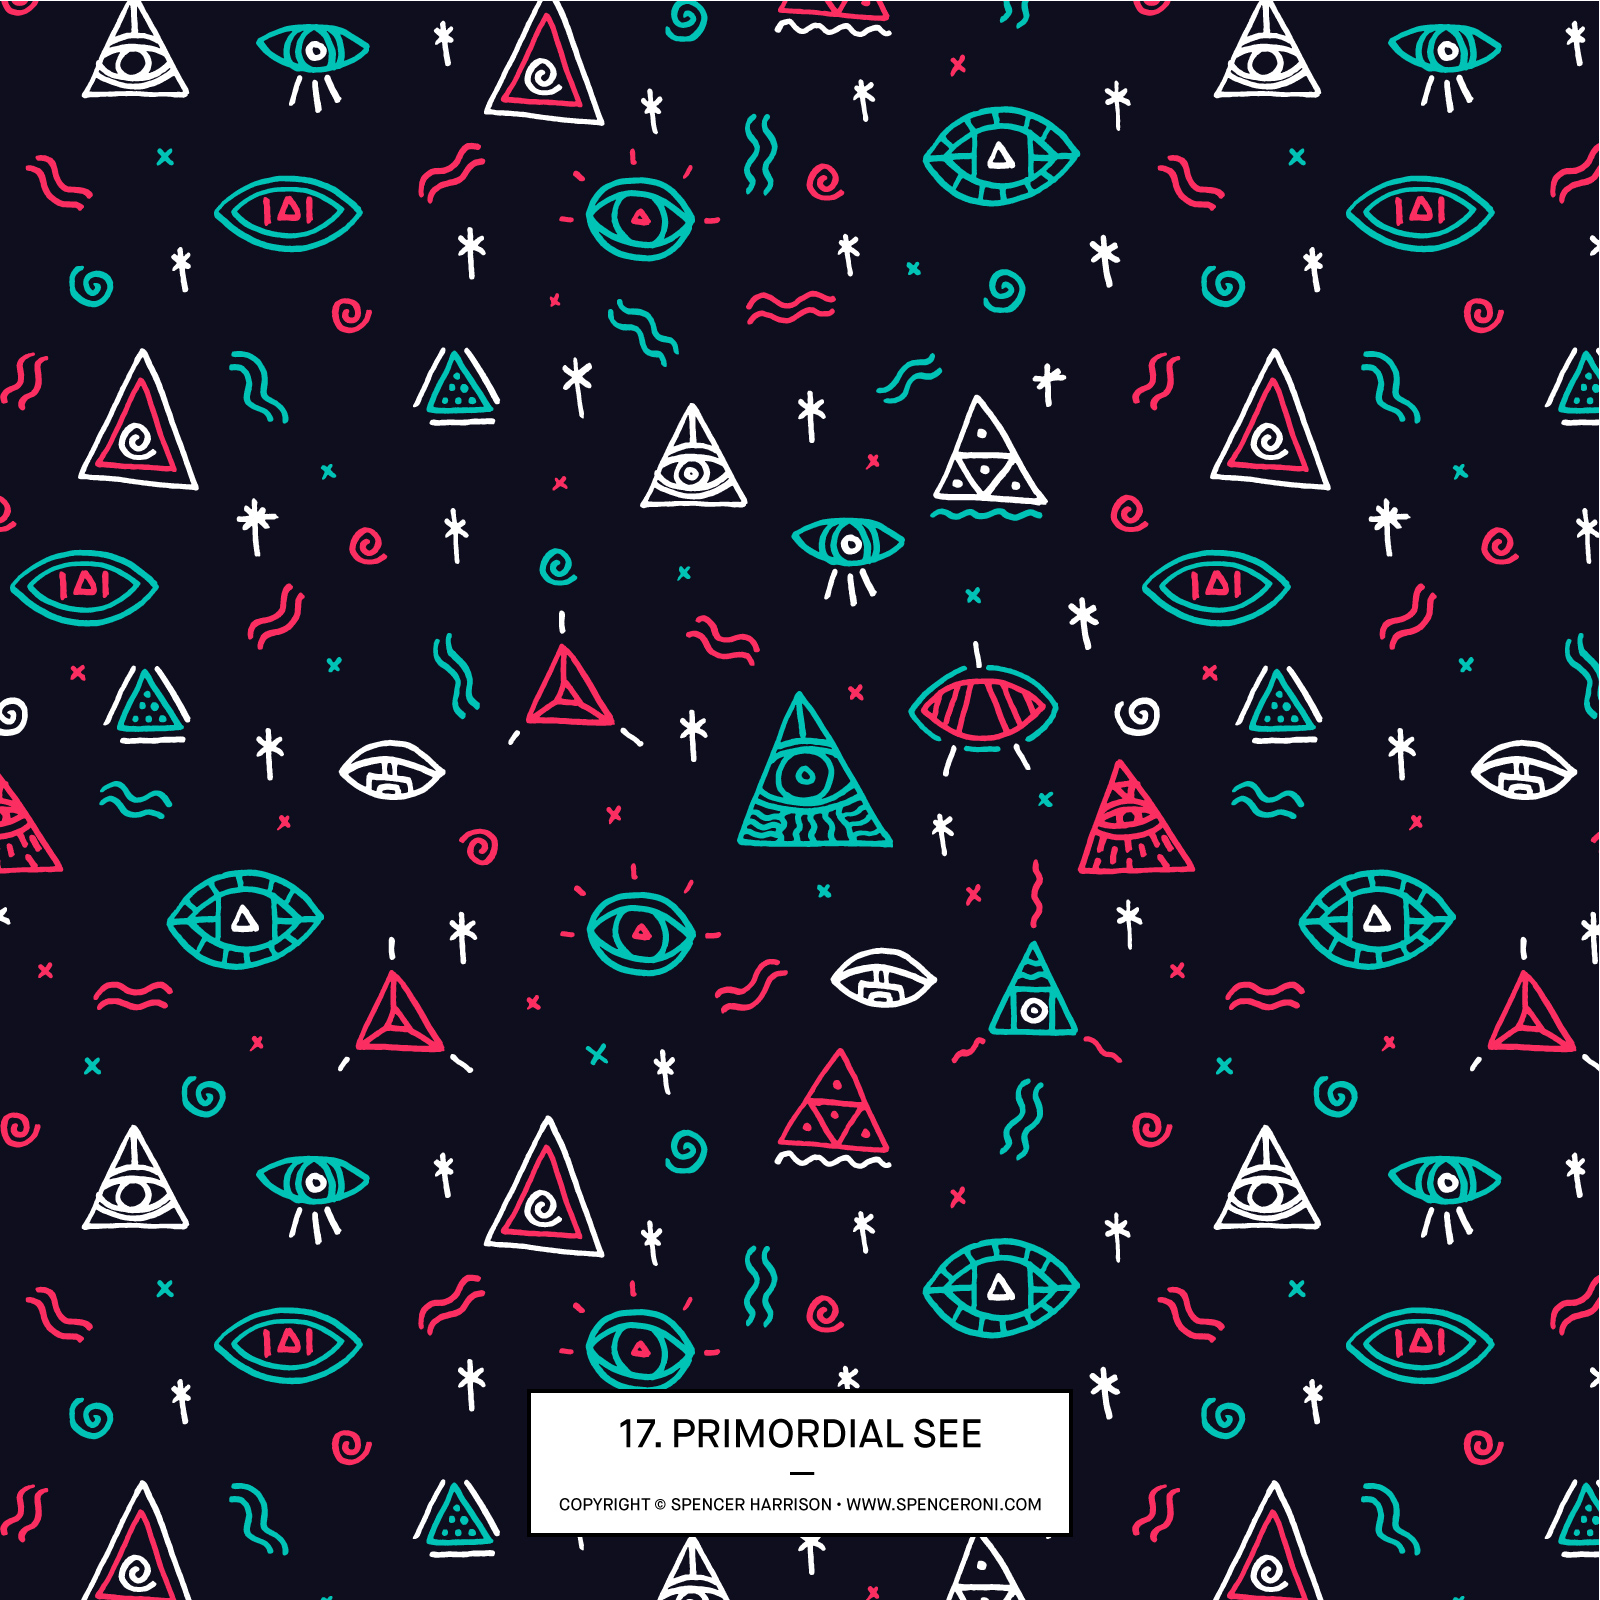 Spenceroni-Pattern-17.jpg